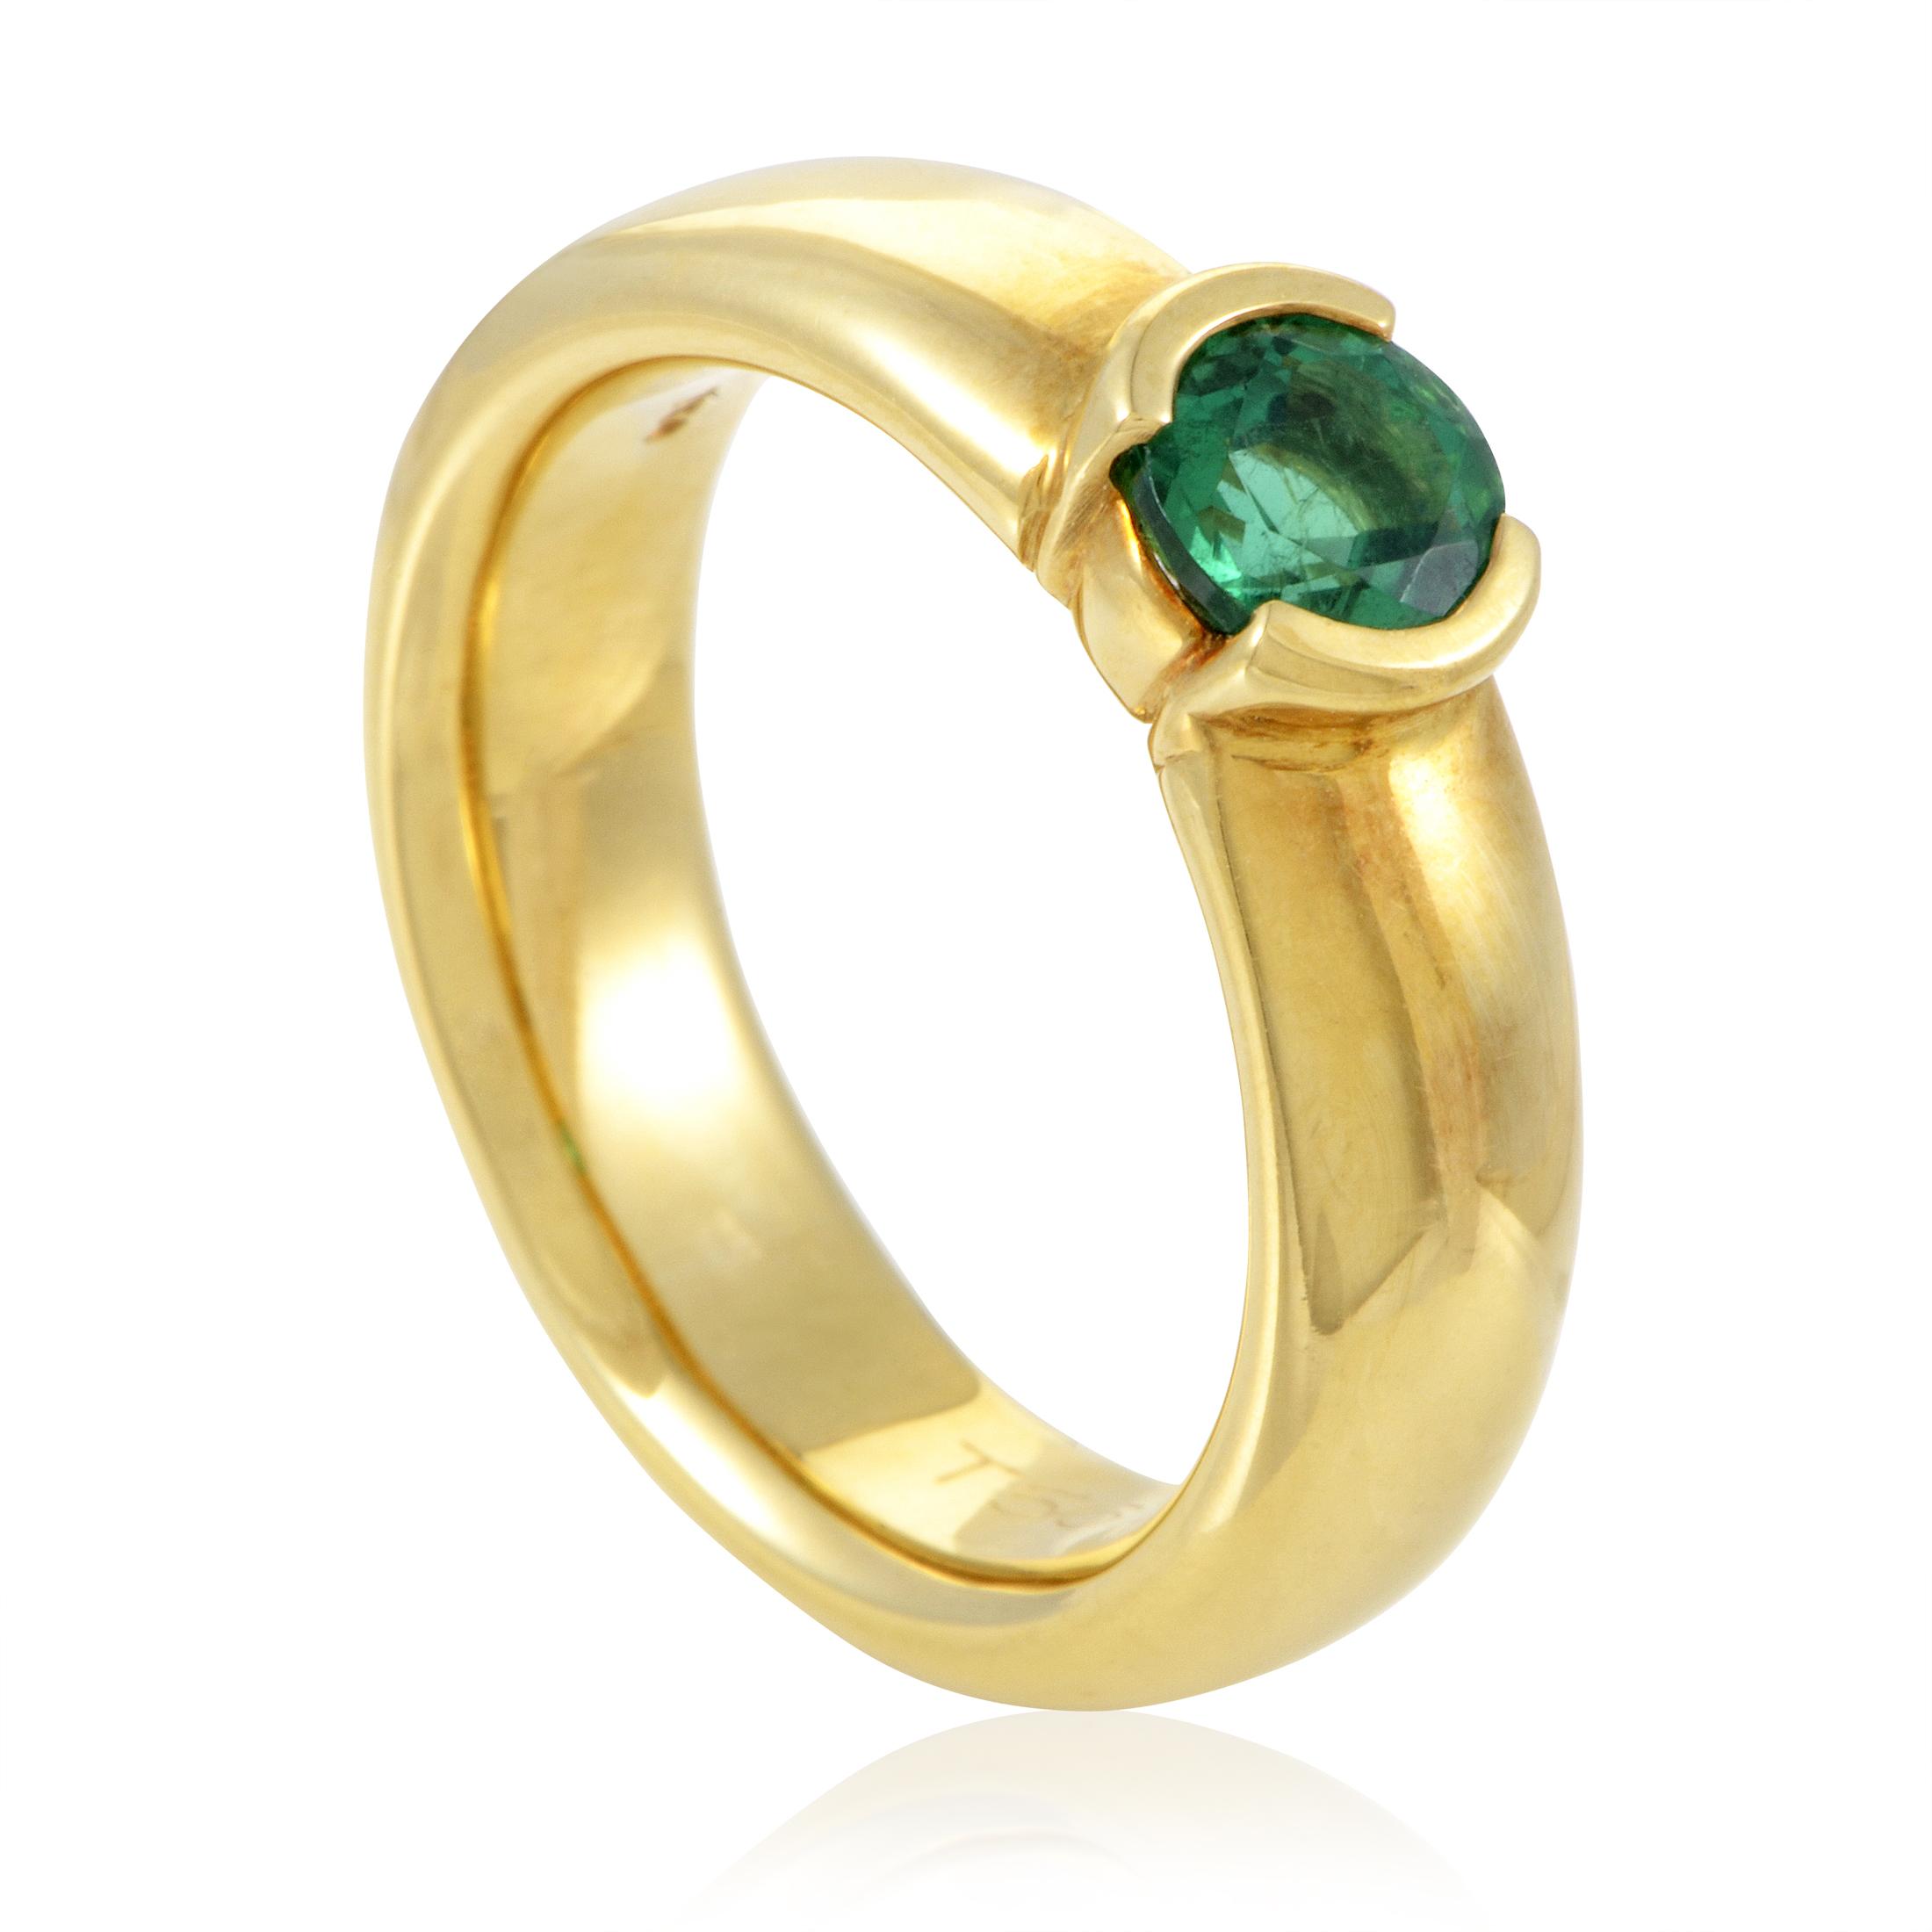 Tiffany & Co. Etoile Women's 18K Yellow Gold Emerald Ring